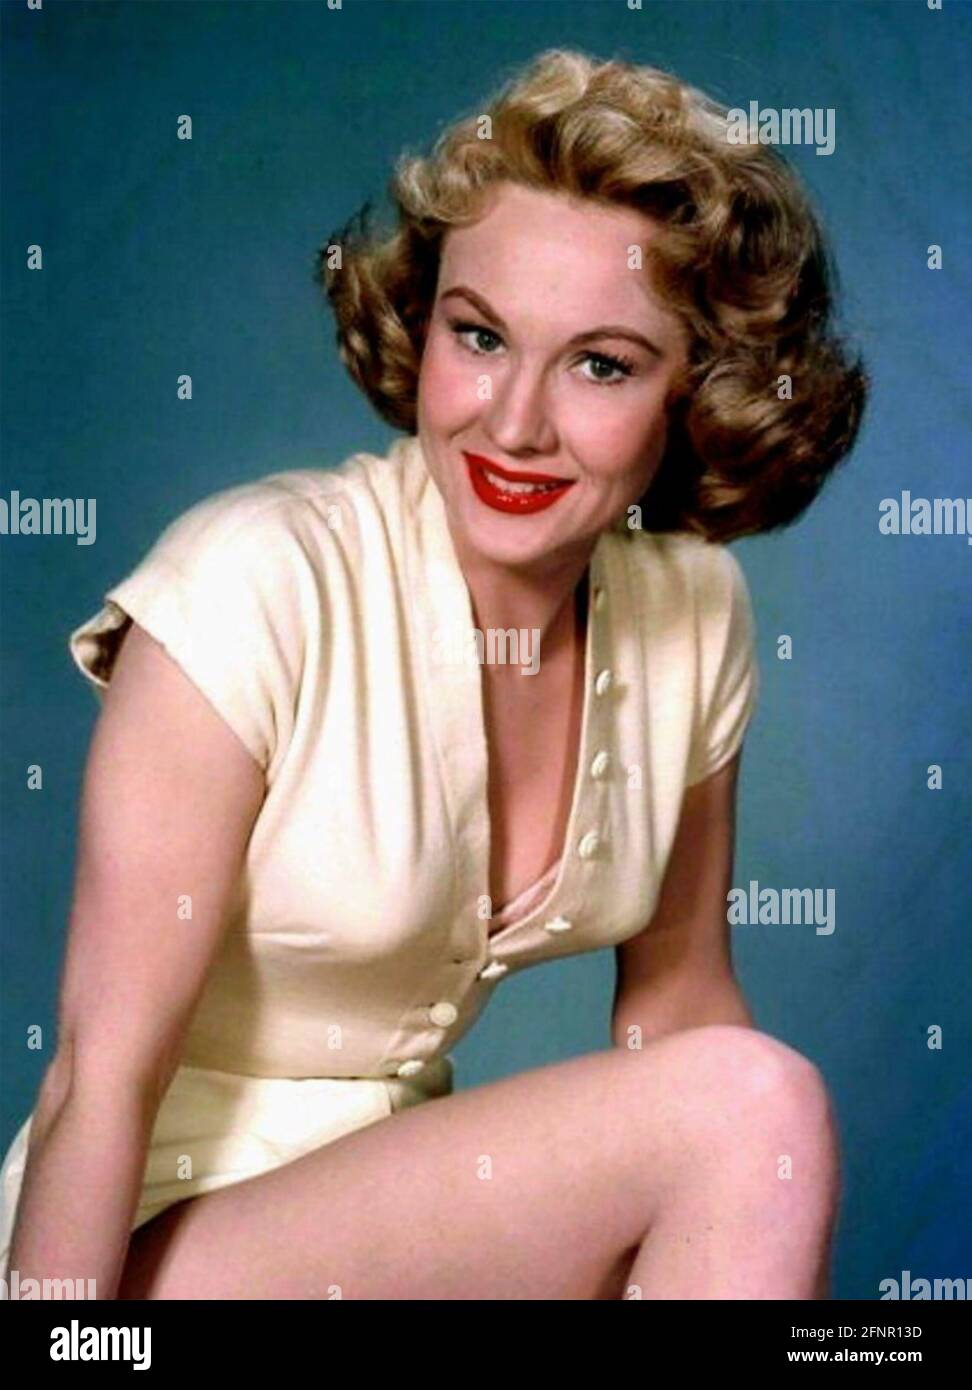 VIRGINIA MAYO (1920-2005) actrice américaine de film vers 1955 Banque D'Images